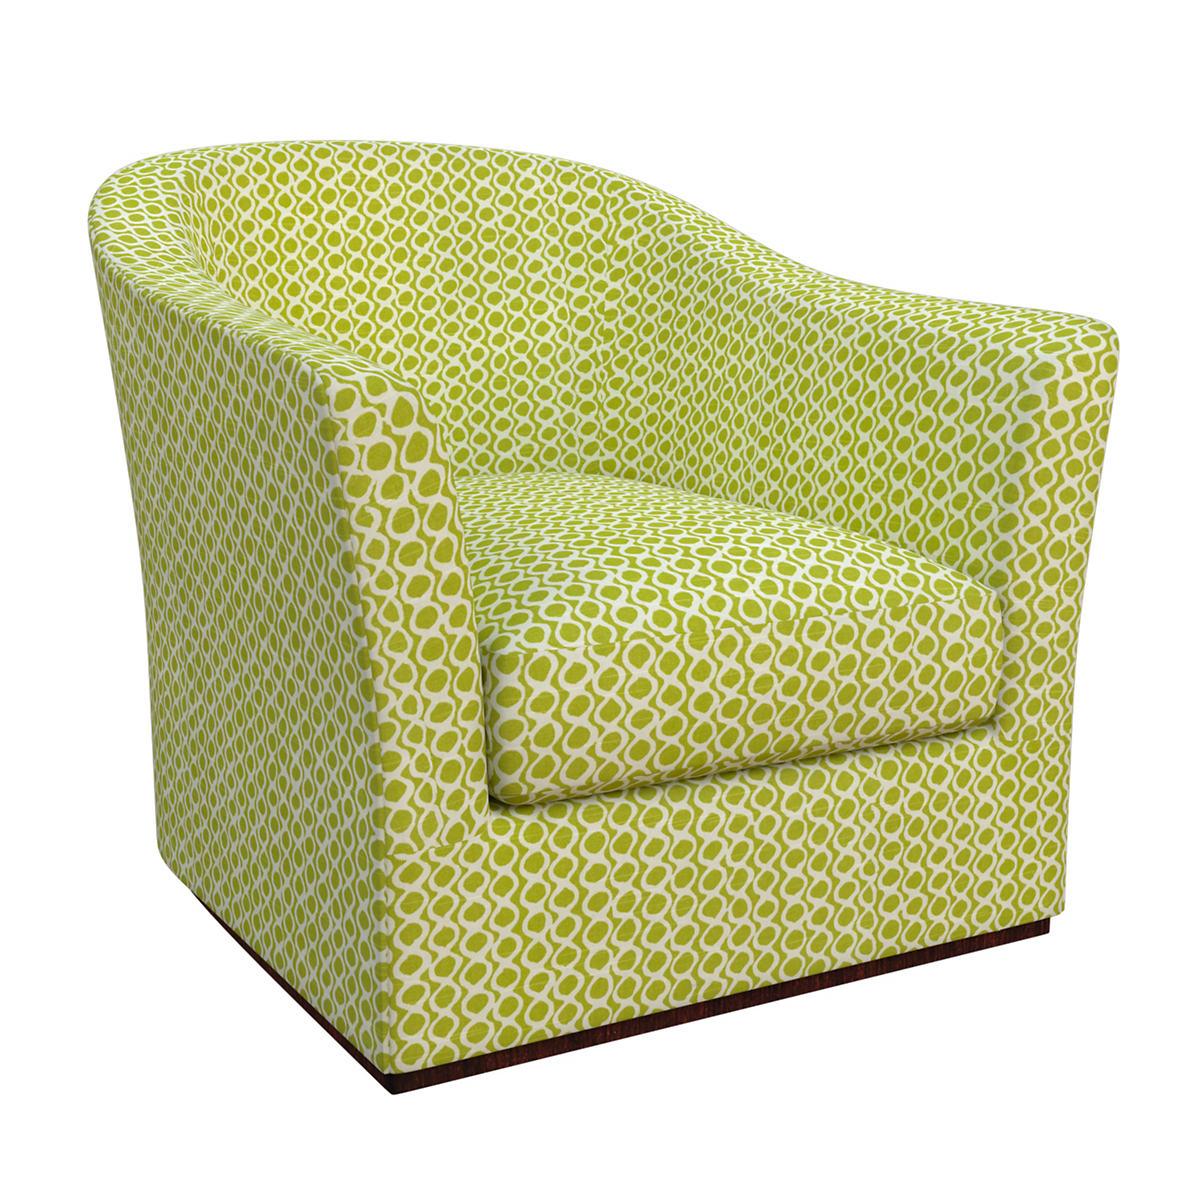 Beads Dark Green Thunderbird Chair